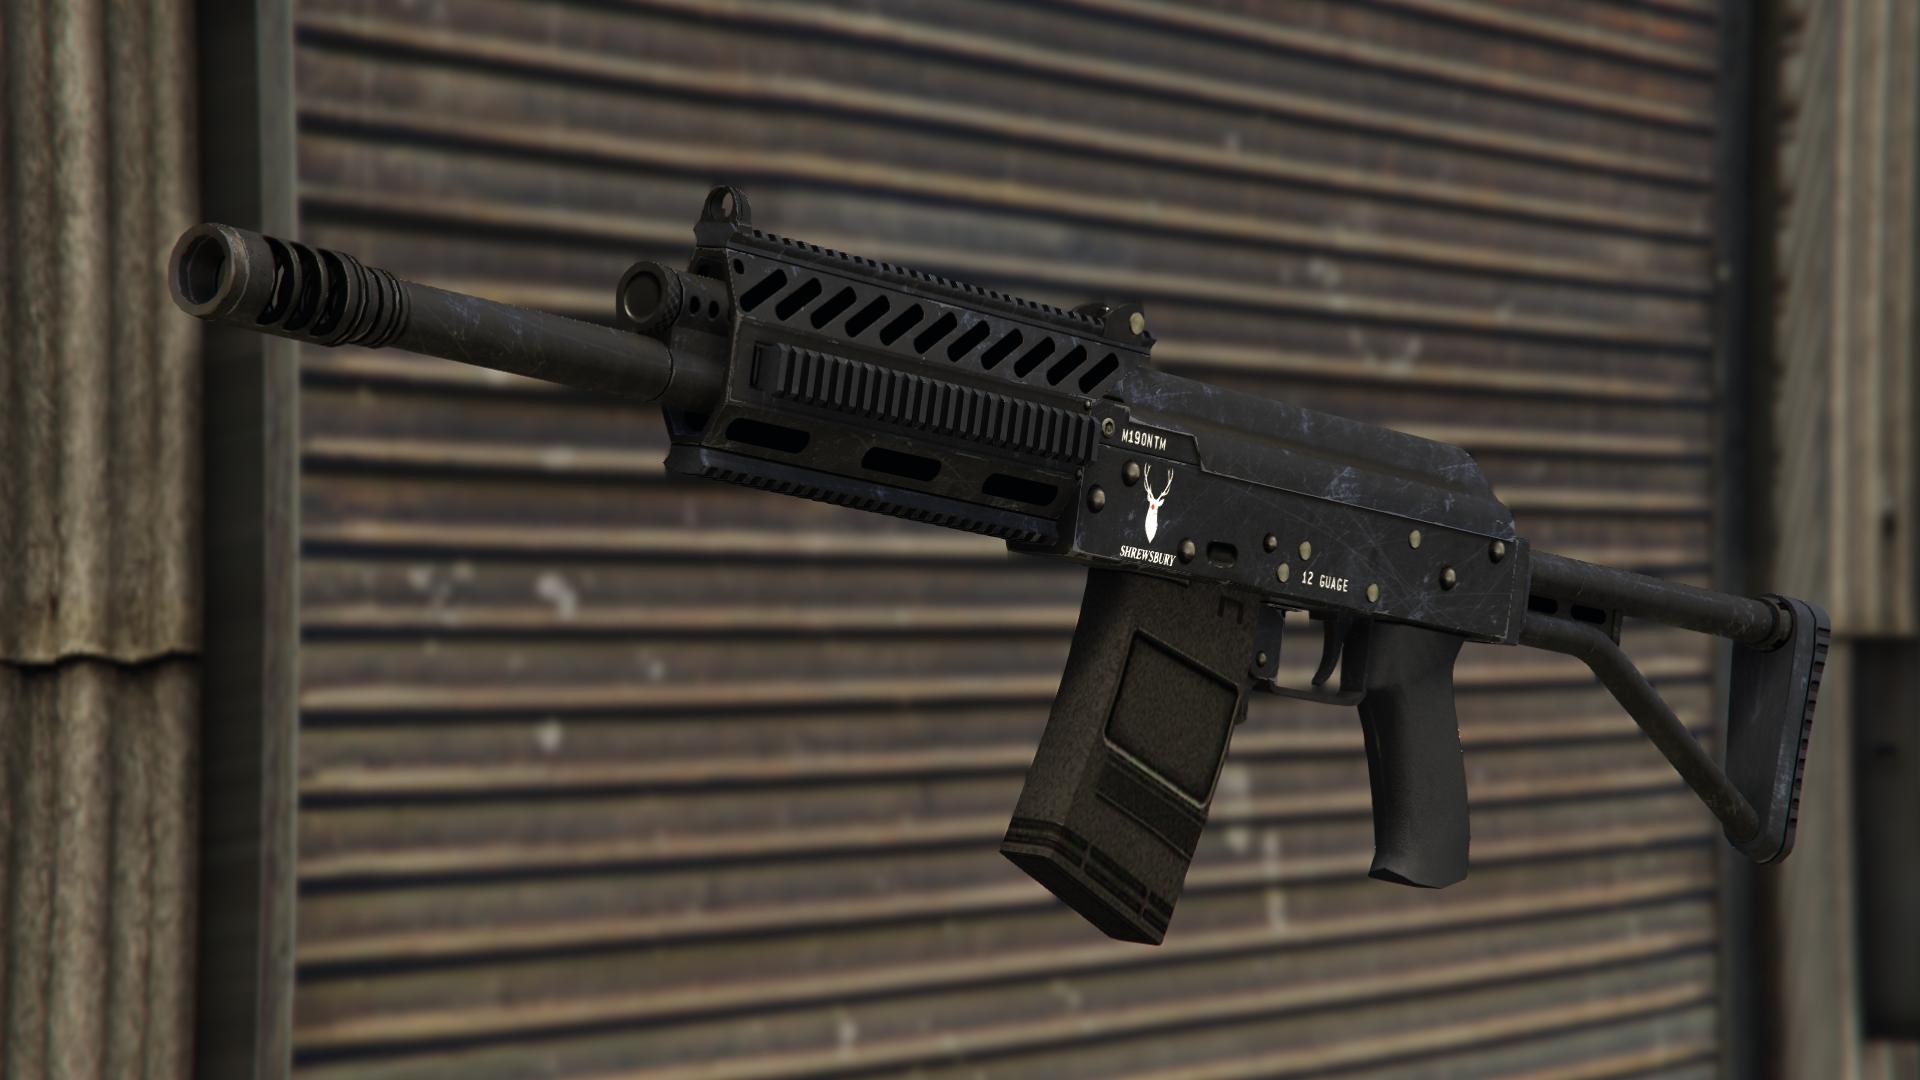 The Heavy Shotgun in Grand Theft Auto